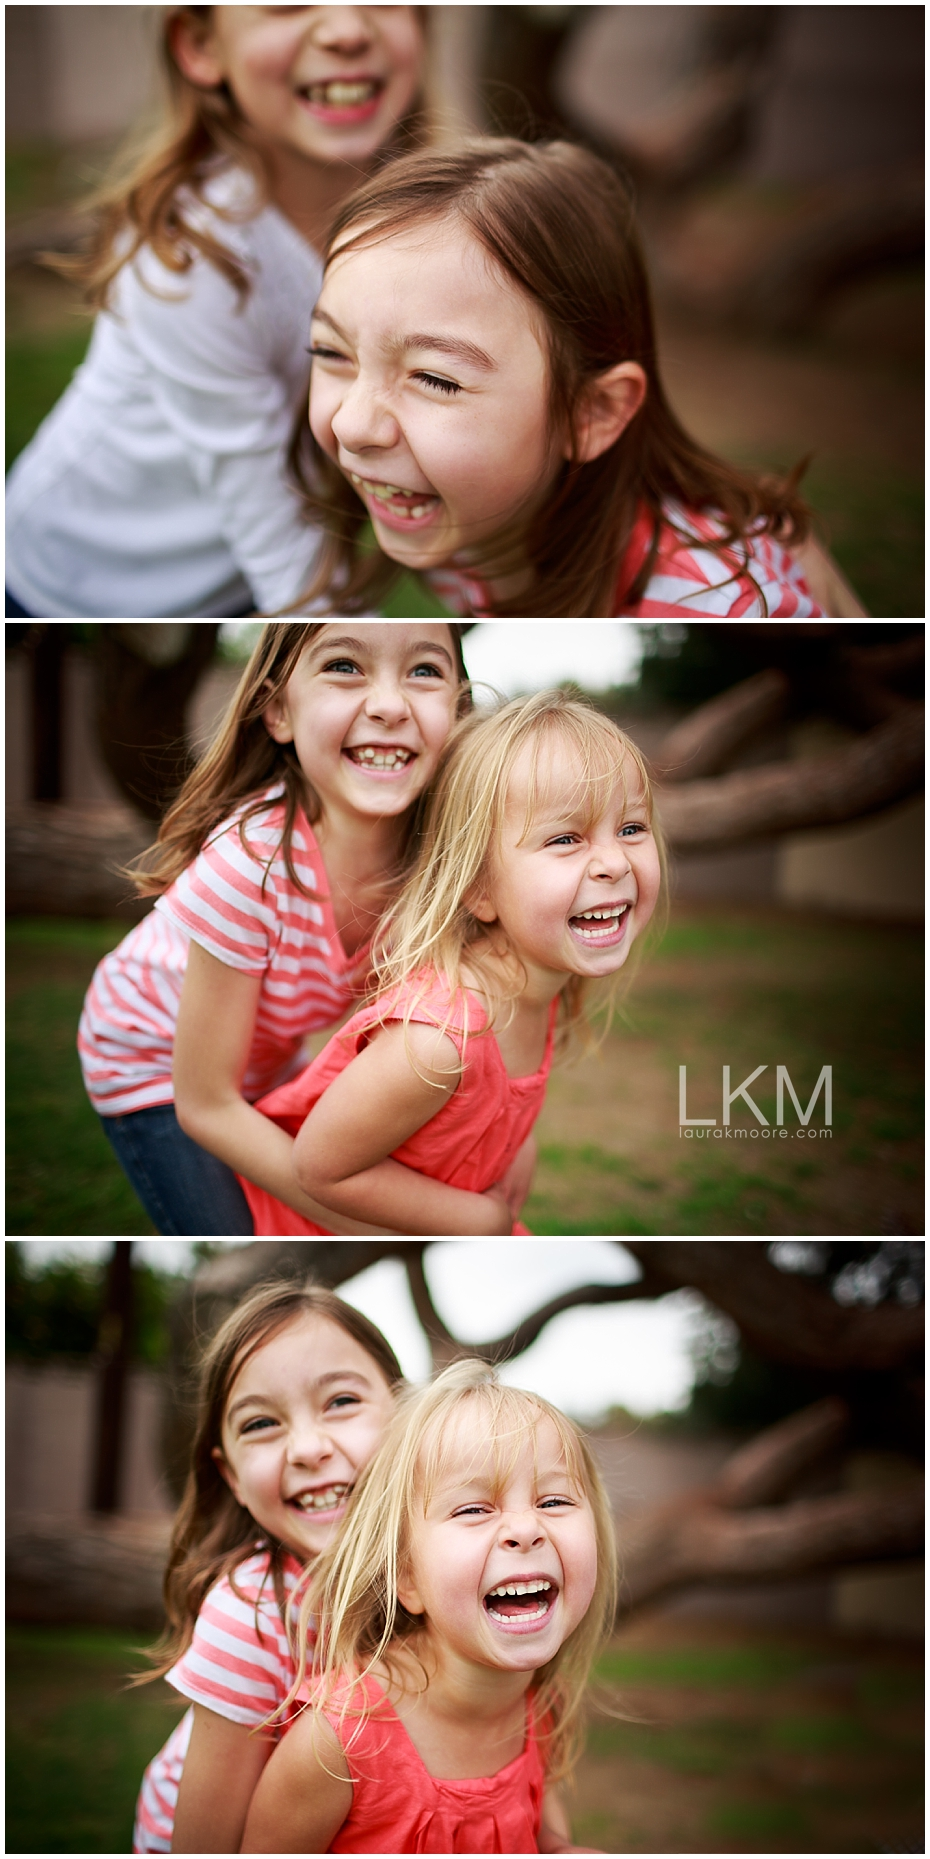 upland-family-portrait-photographer-mikat_0019.jpg